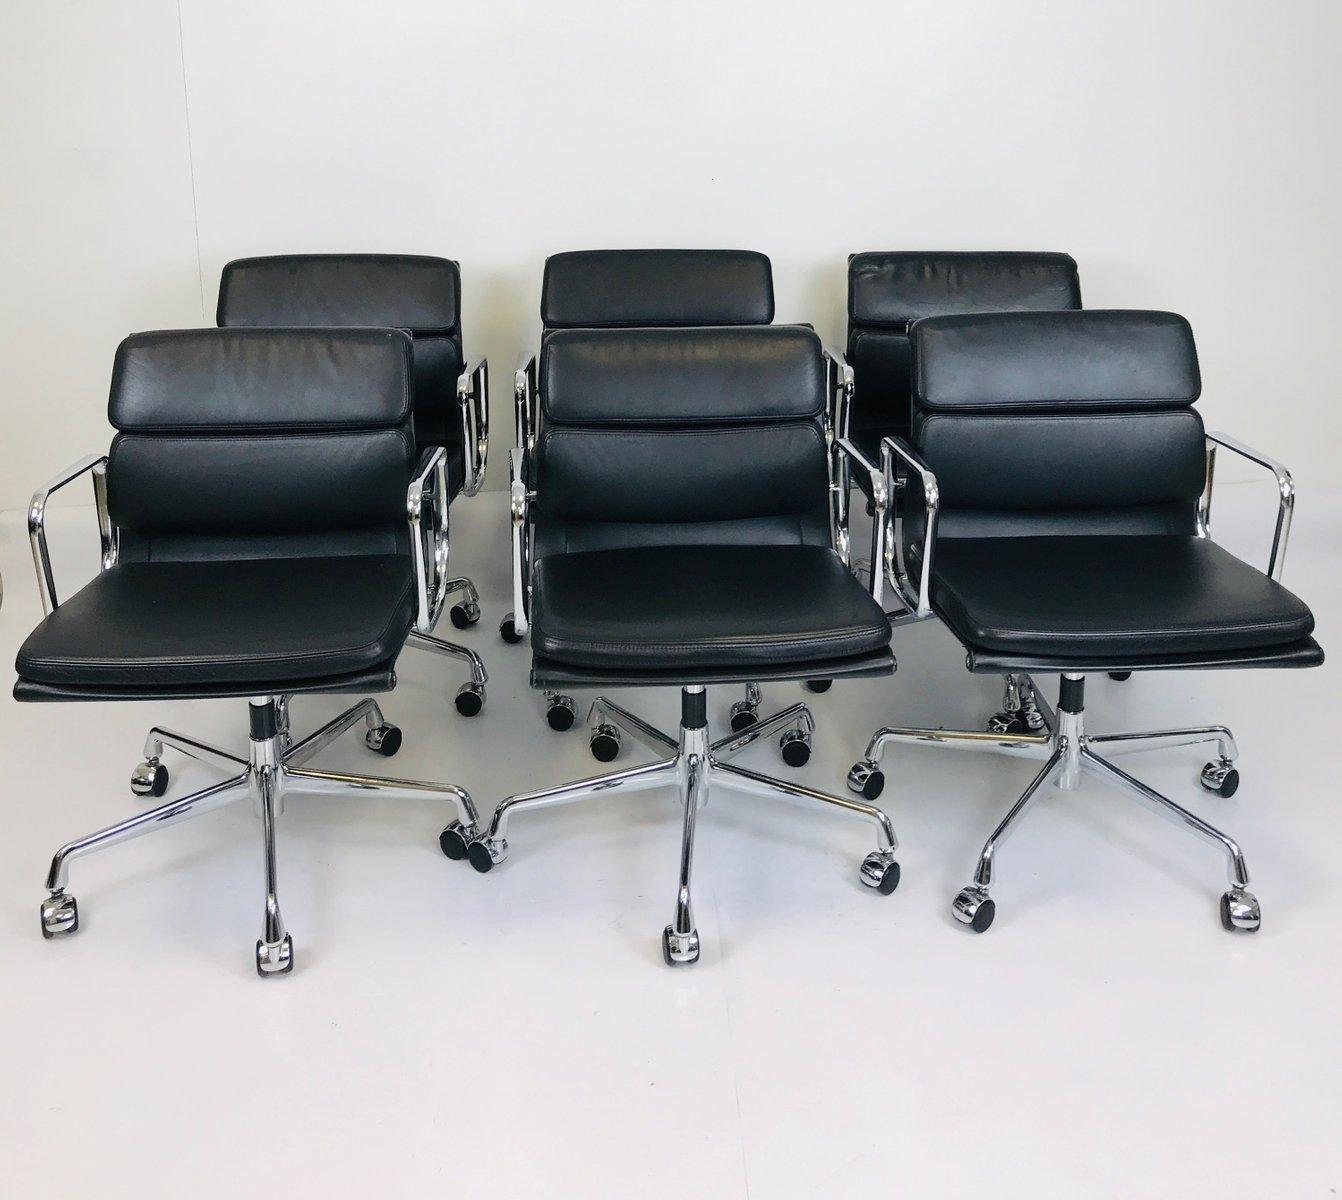 ea217 stuhl von charles ray eames f r vitra 1980er bei. Black Bedroom Furniture Sets. Home Design Ideas